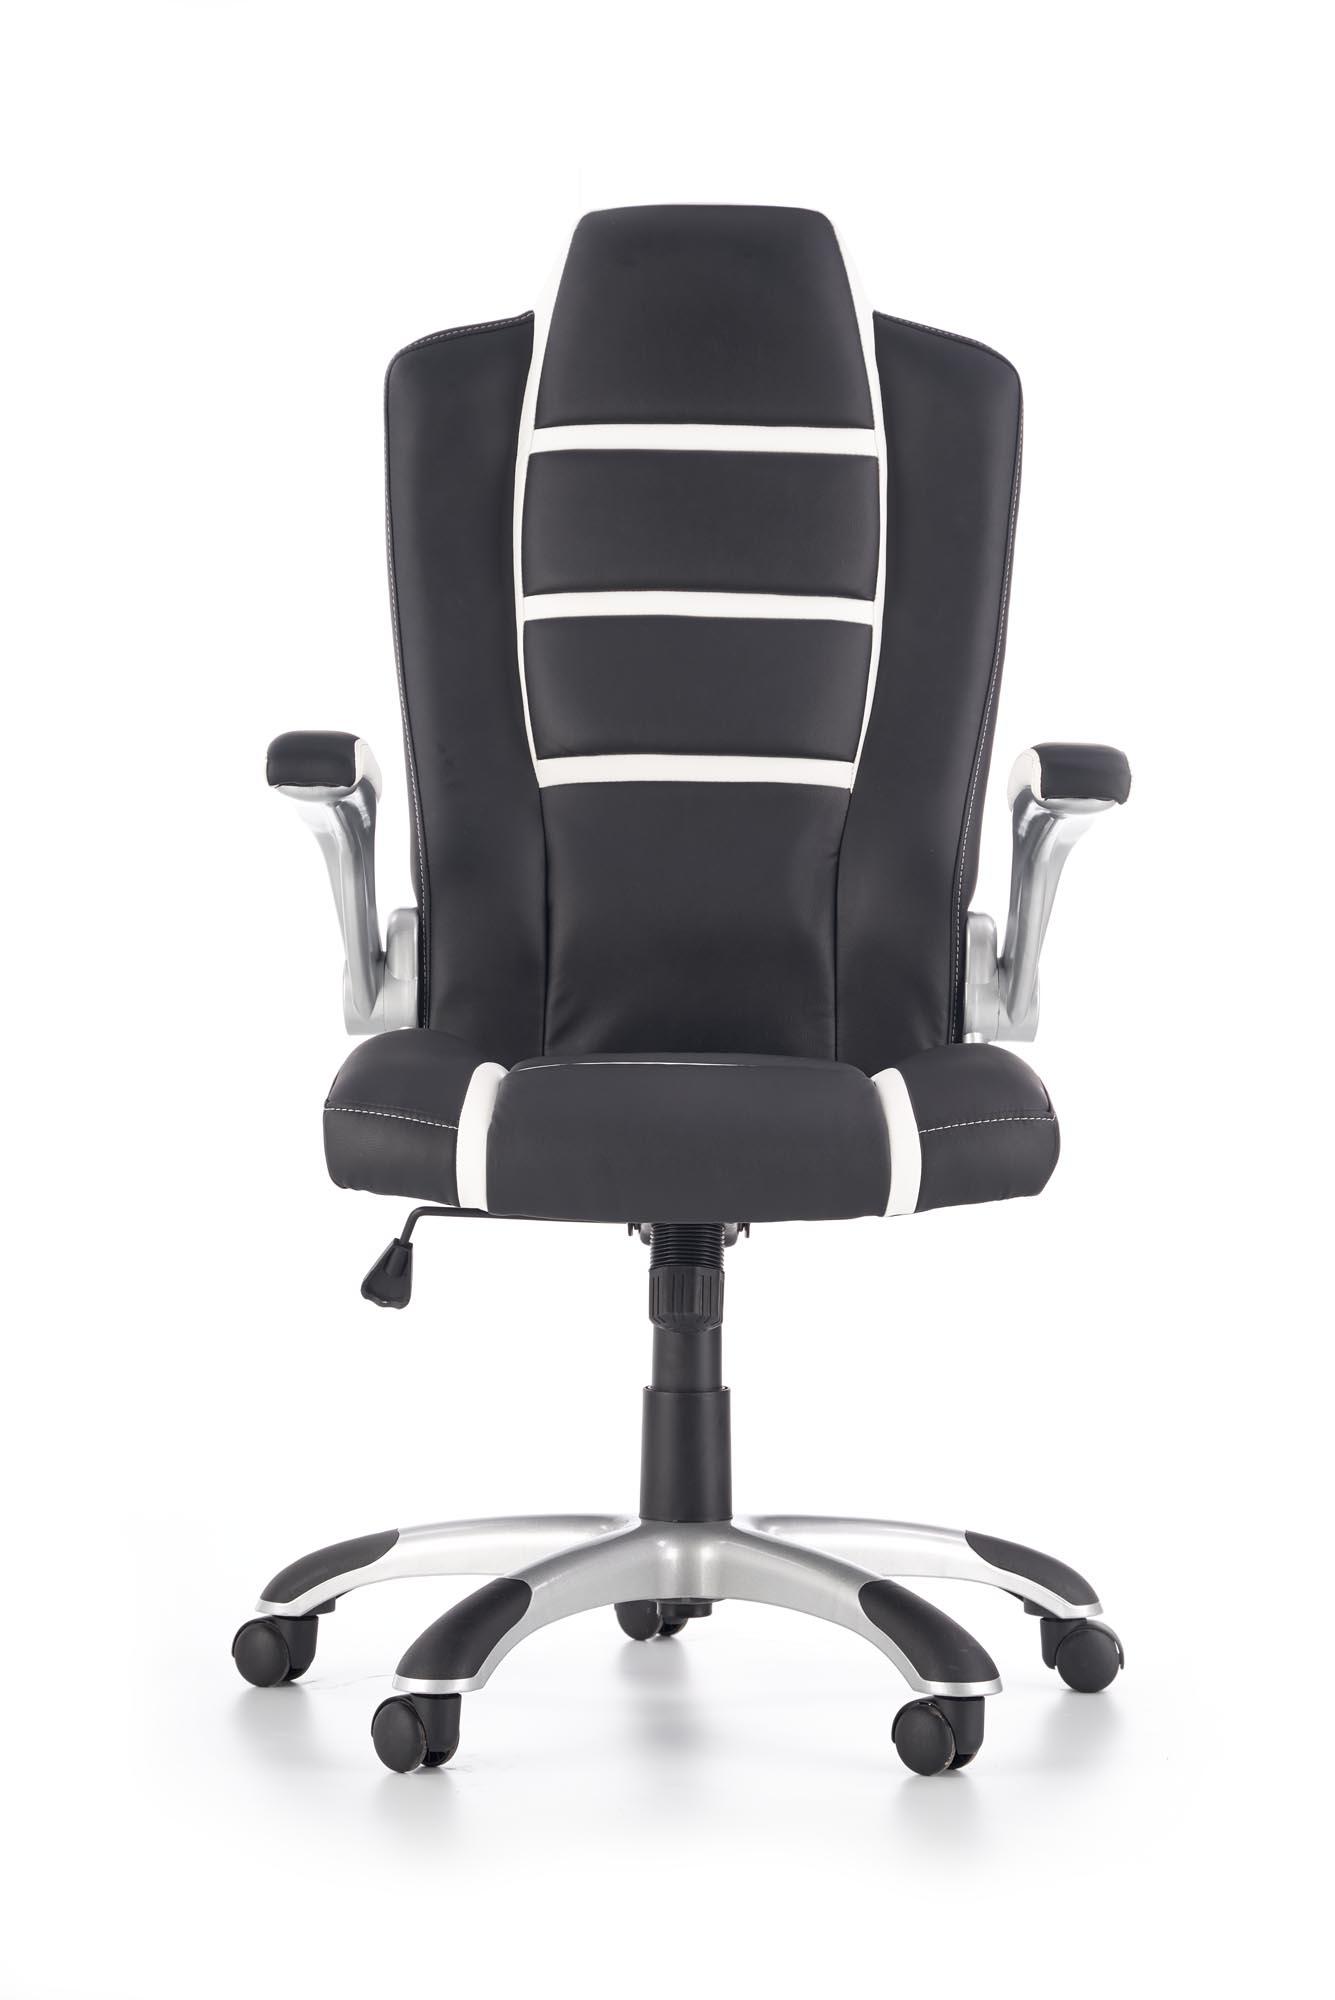 Scaun de birou ergonomic tapitat cu piele ecologica Fast Black / White, l65xA74xH116-126 cm poza